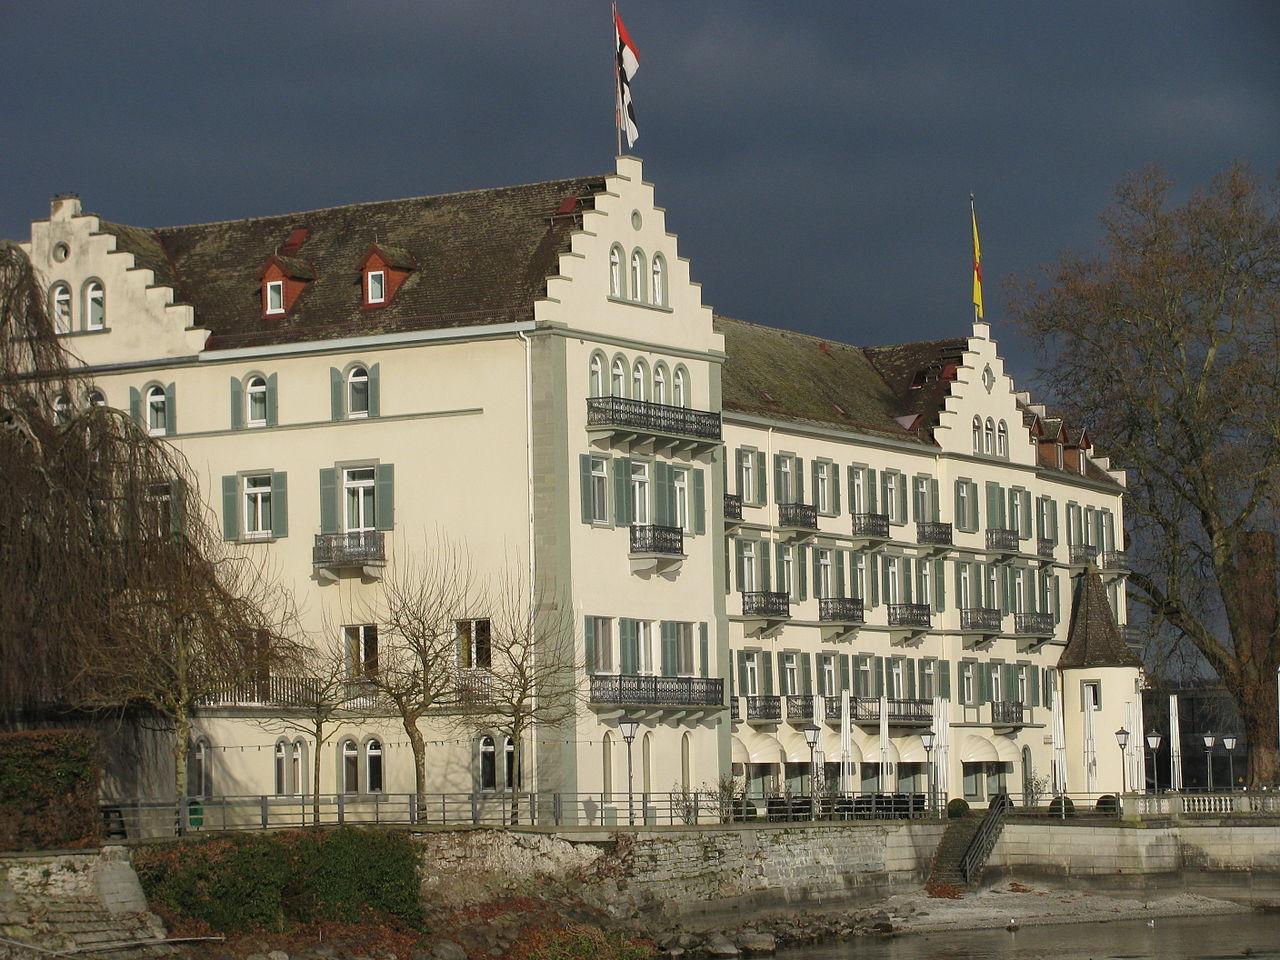 Steigenberger Hotel Baden Baden